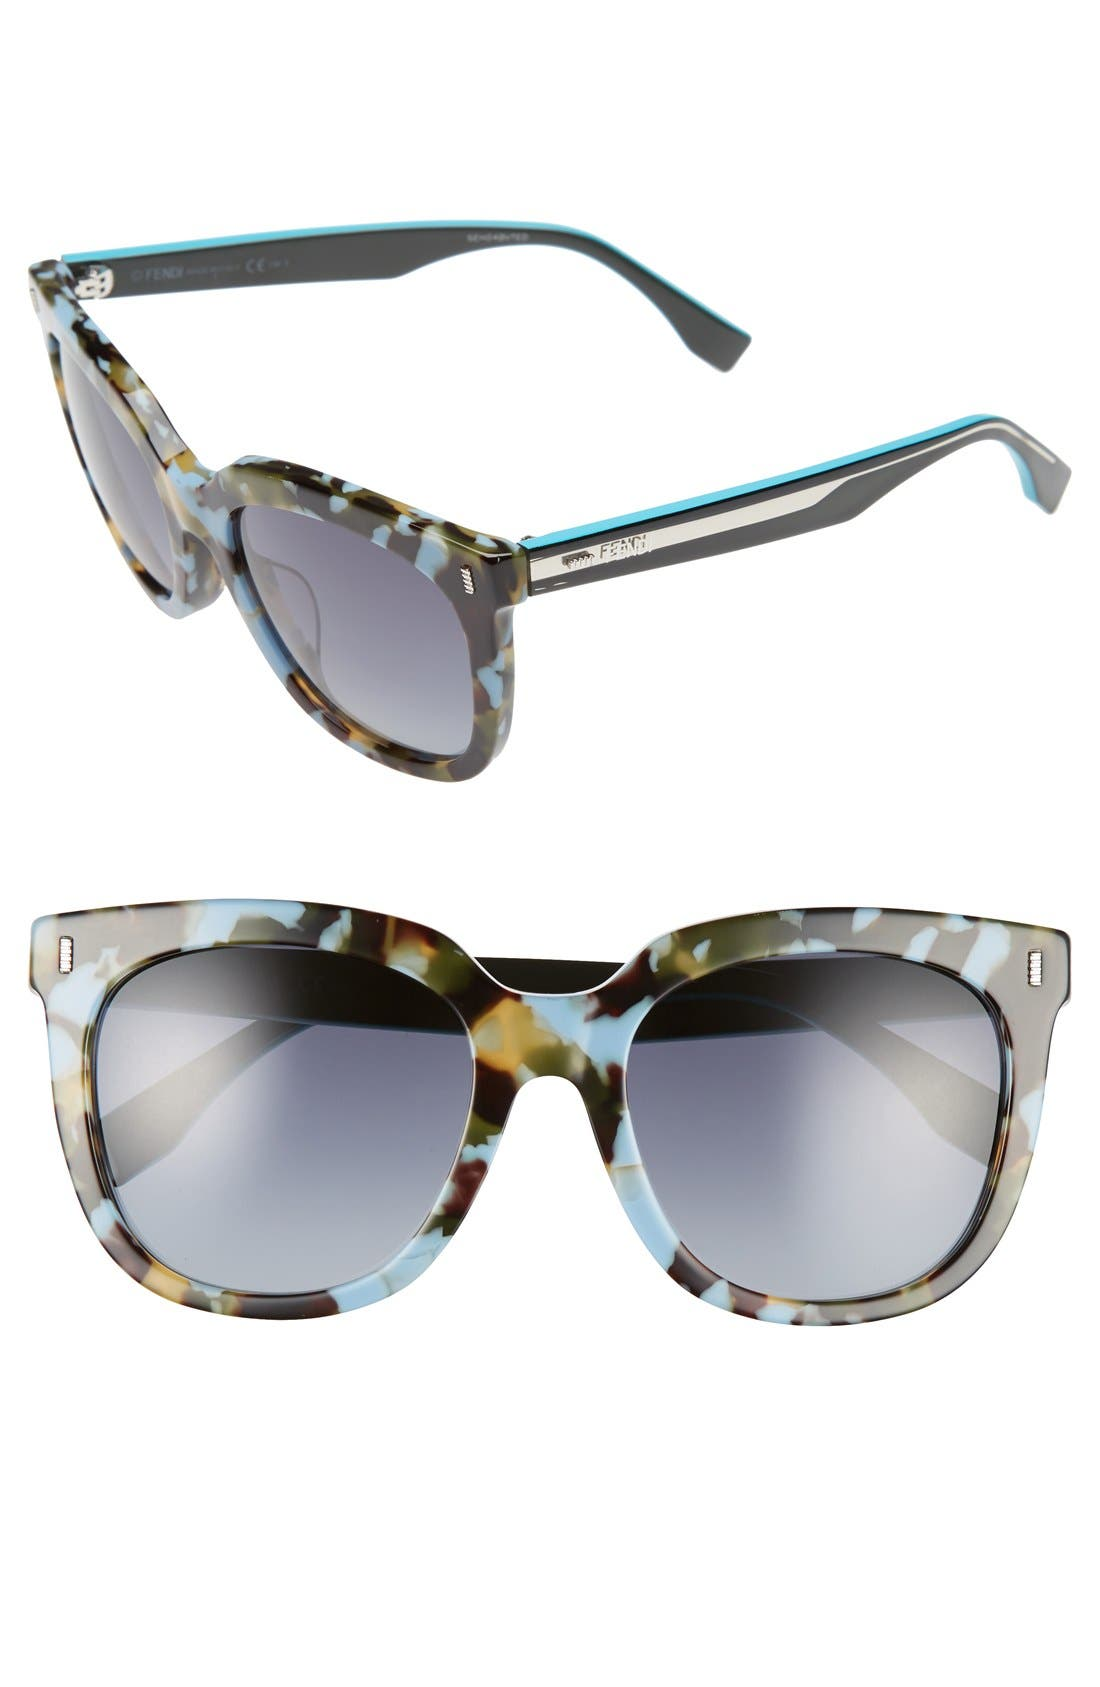 Fendi 54mm Retro Sunglasses